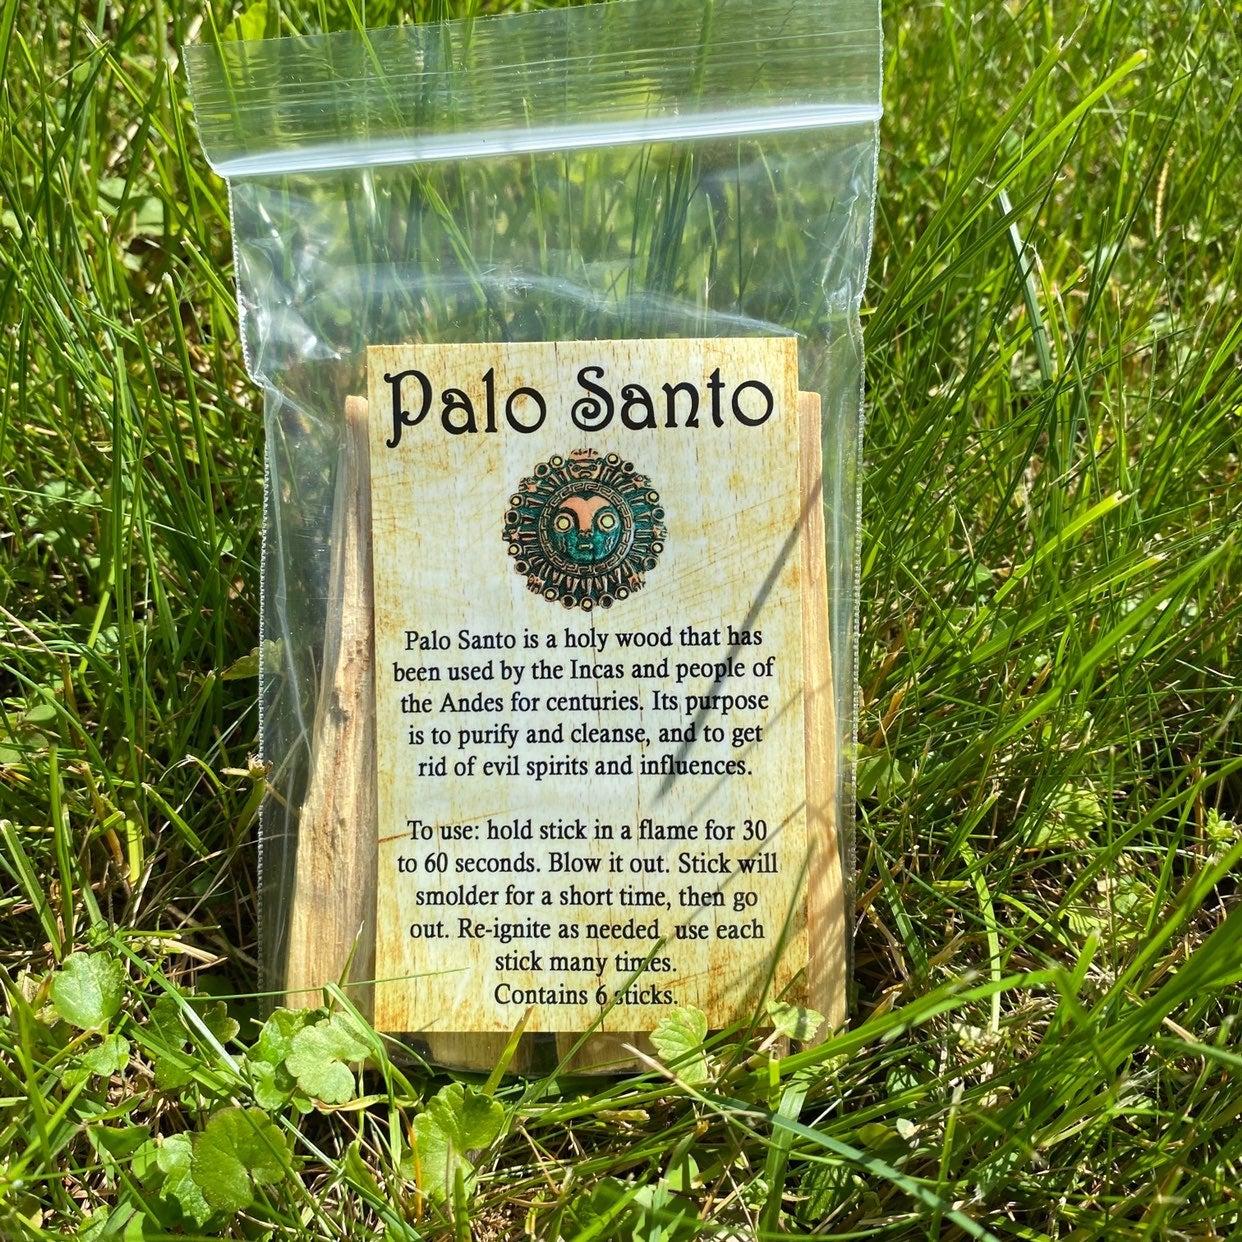 PREMIUM Palo Santo Sticks - 5 Pack